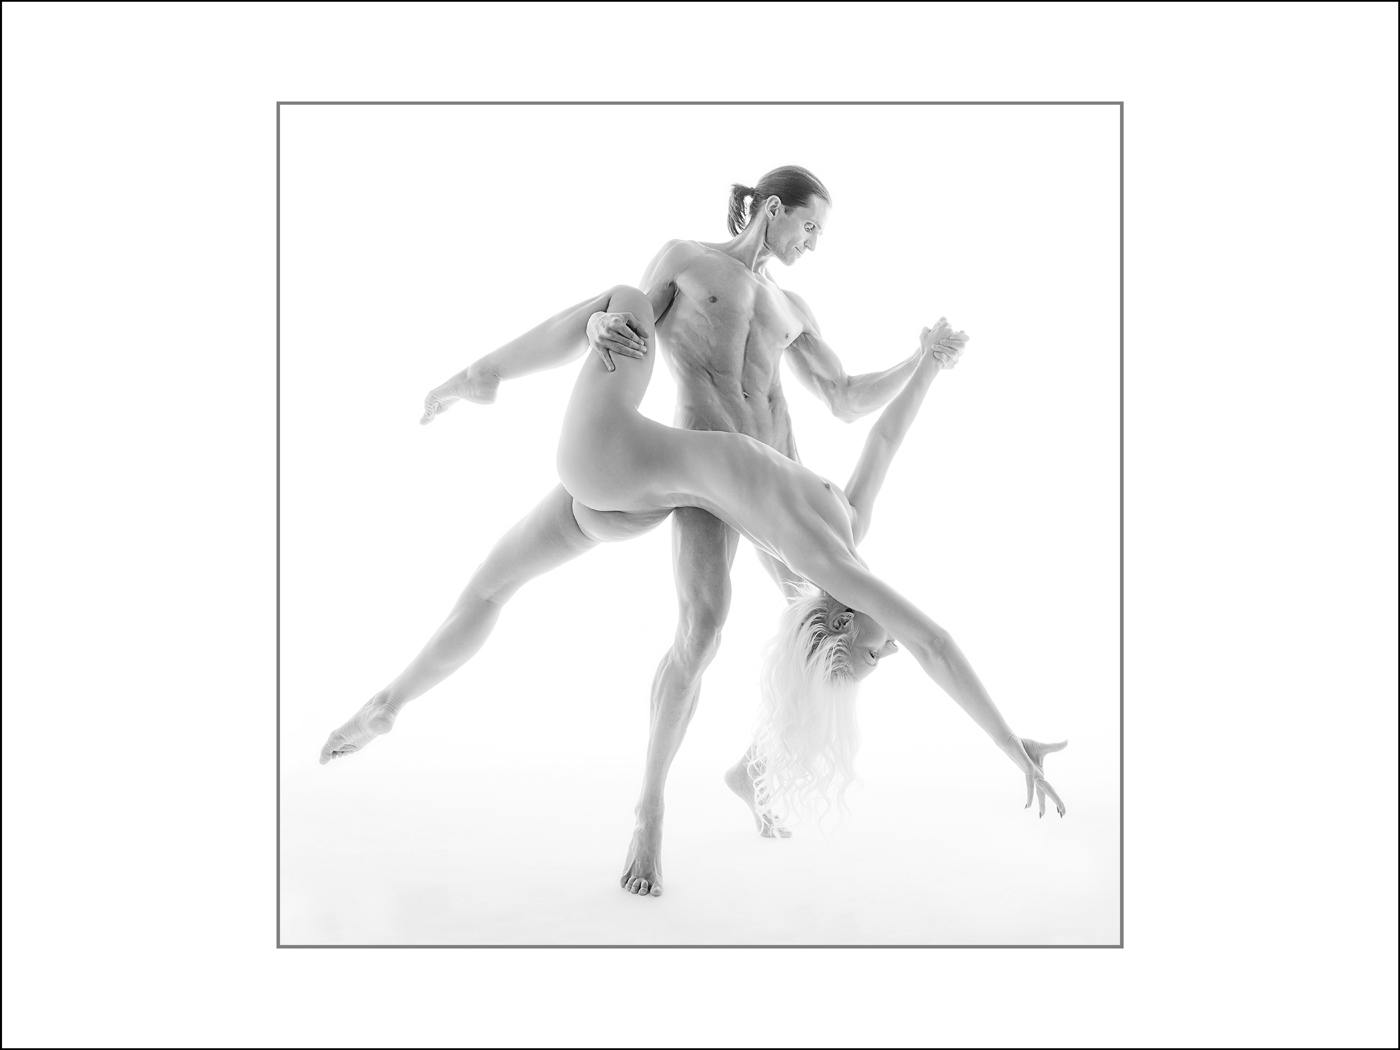 2017 Silbermedaille Trierenberg  Copyright - Thomas Detzner